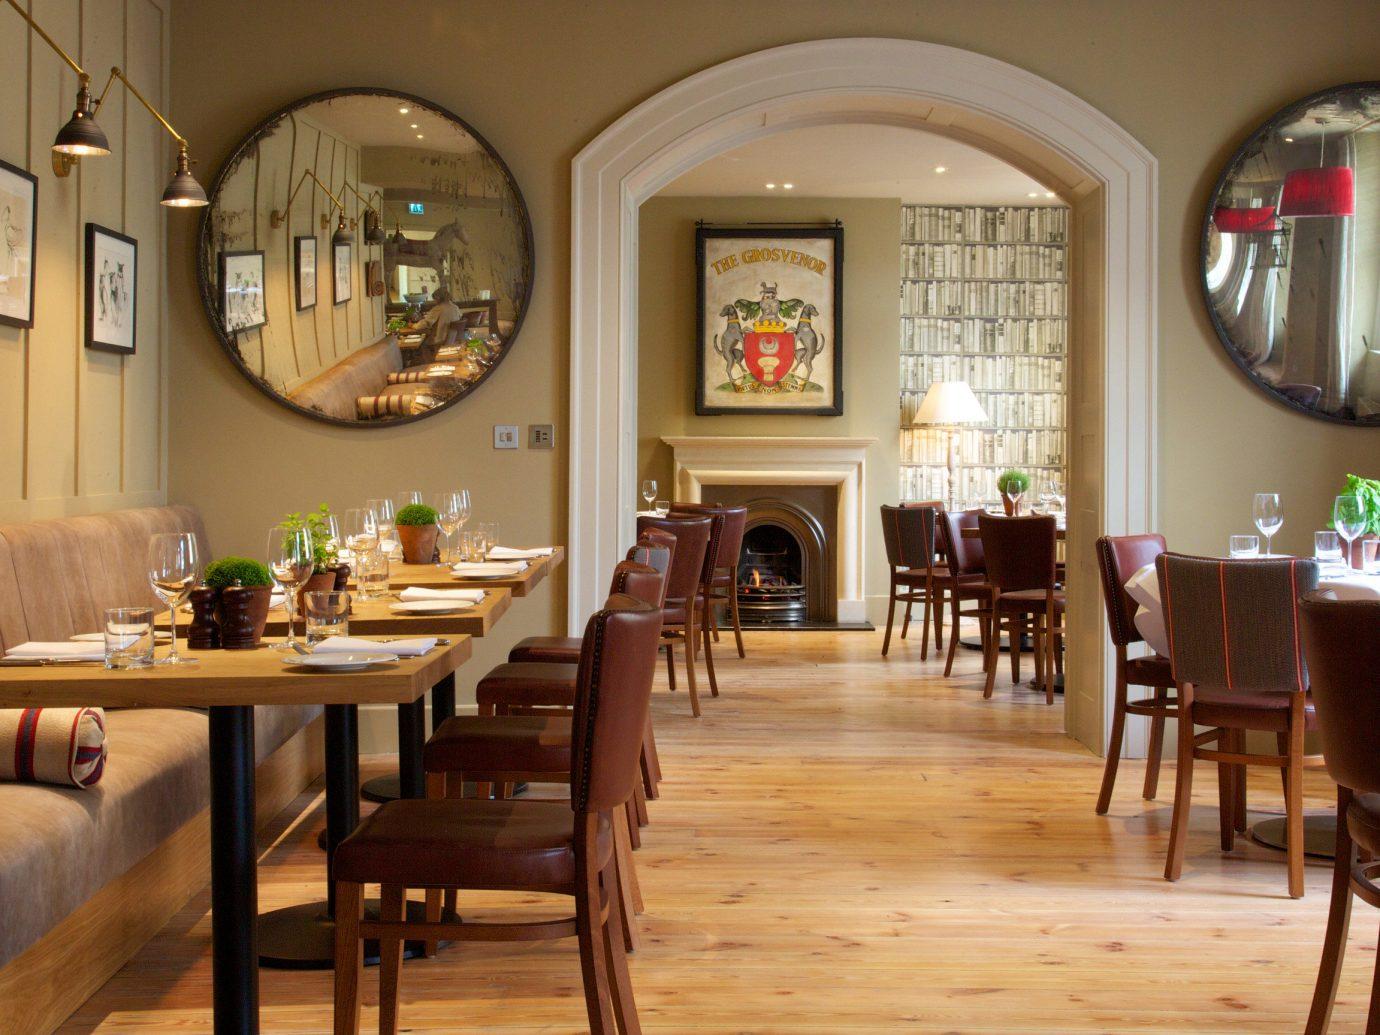 Trip Ideas indoor floor wall table restaurant room dining room Living estate interior design café Bar function hall meal furniture dining table